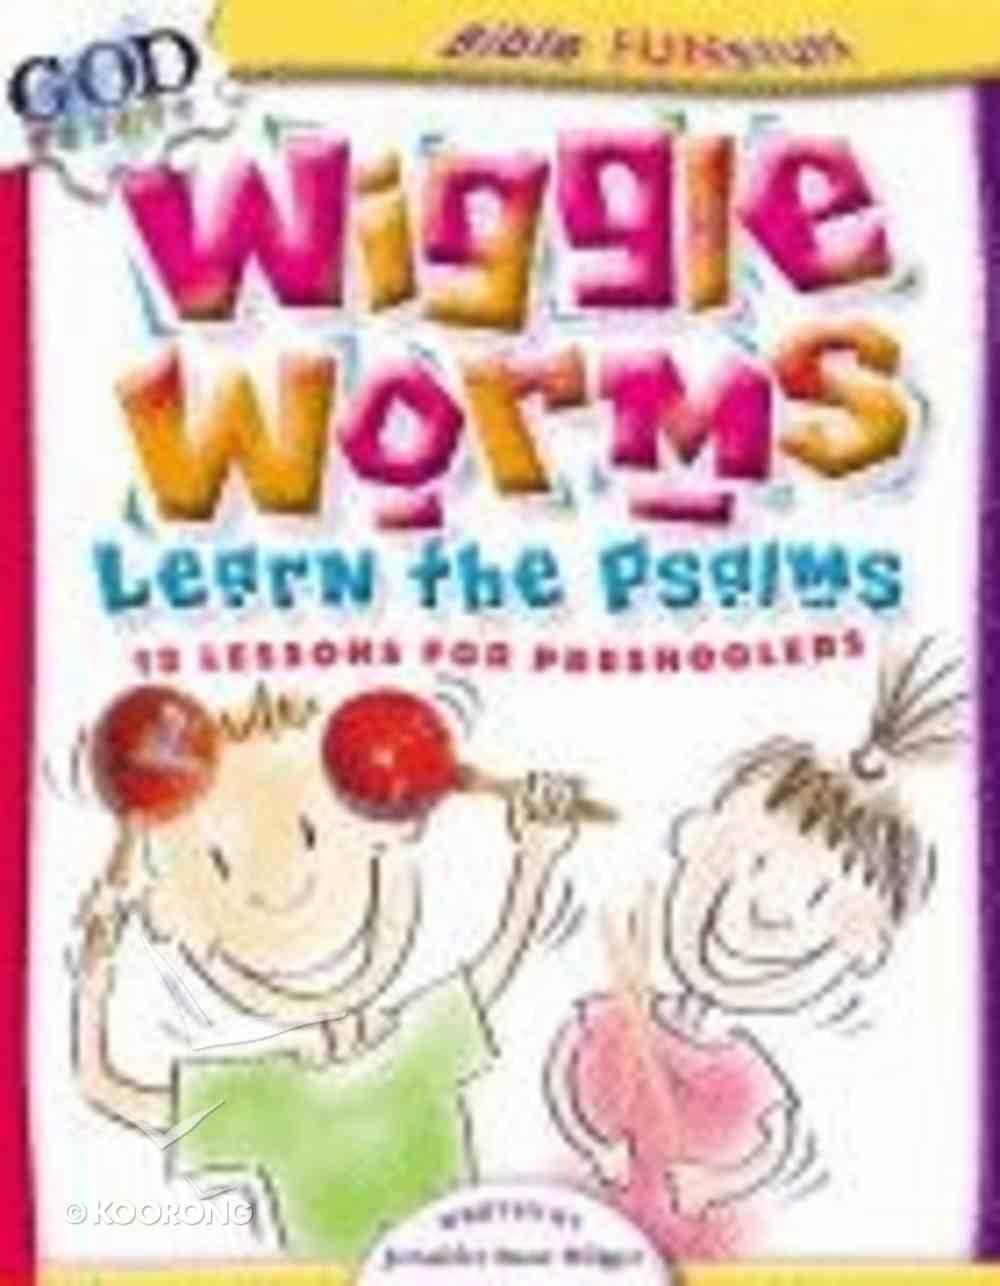 Wiggle Worms Learn the Psalms (Godprints Bible Fun Stuff Series) Paperback